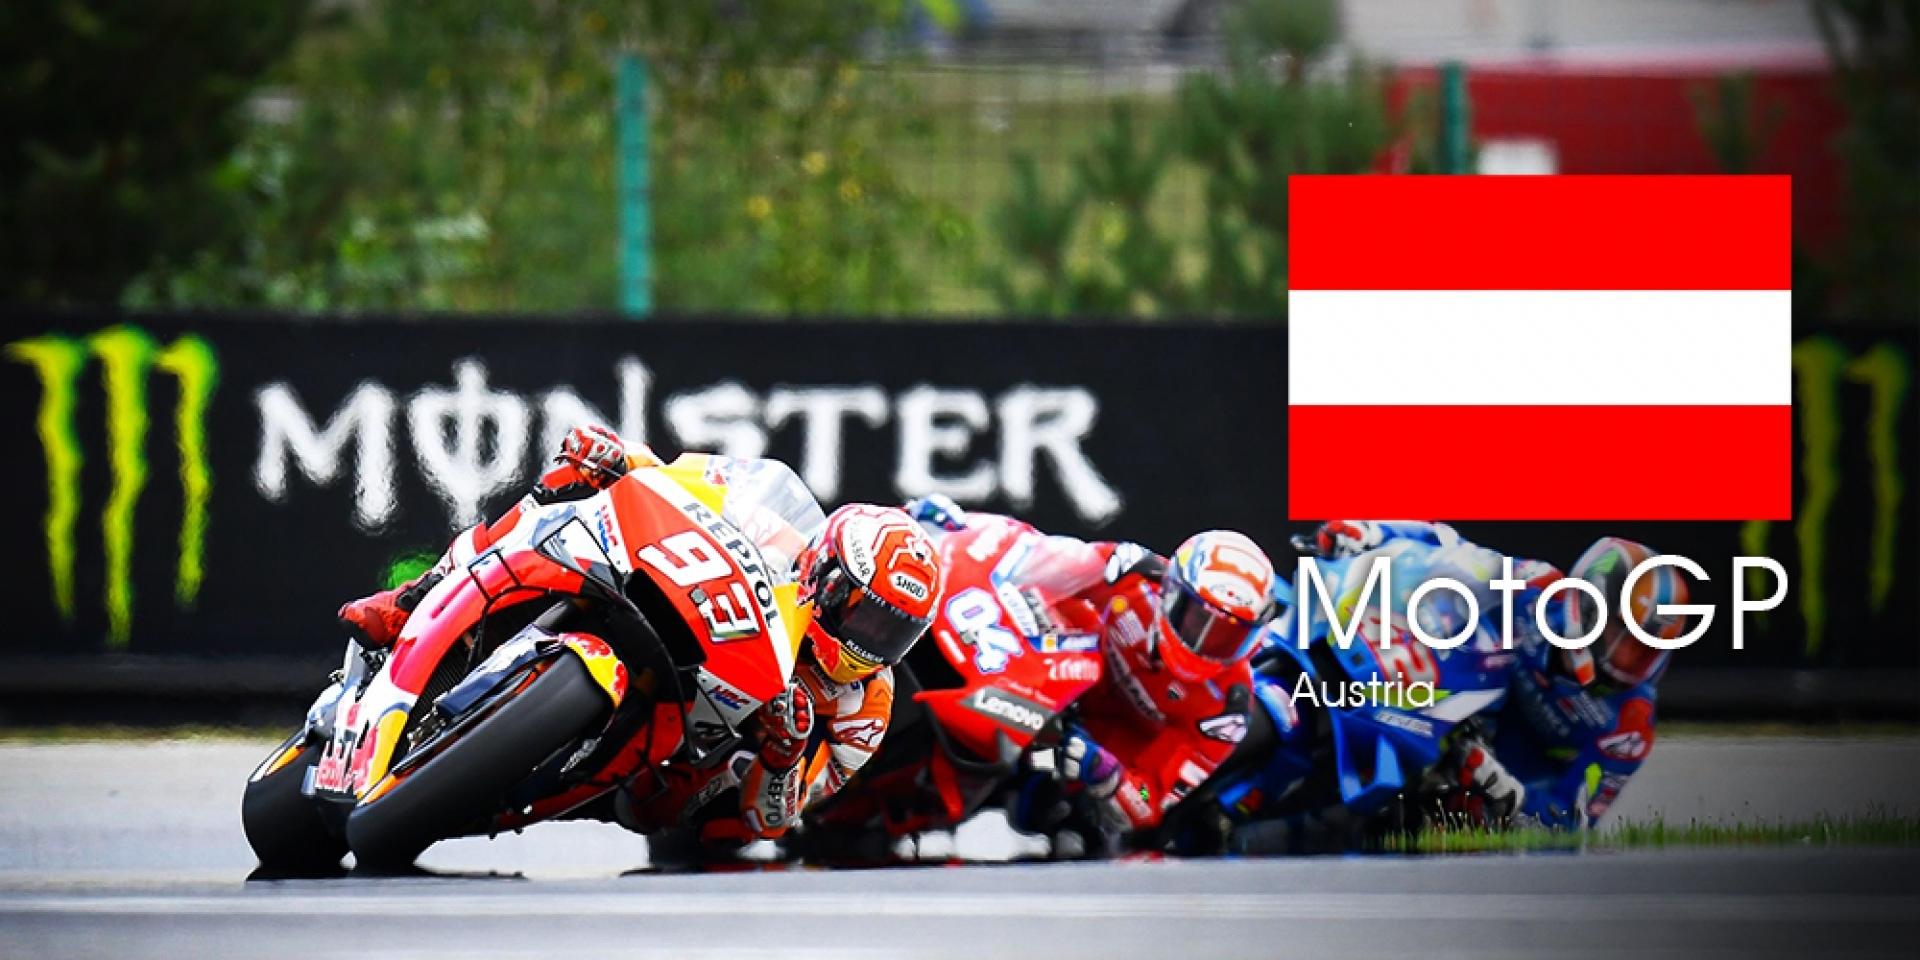 MotoGP 2019 奧地利站 轉播時間   SUPERMOTO8